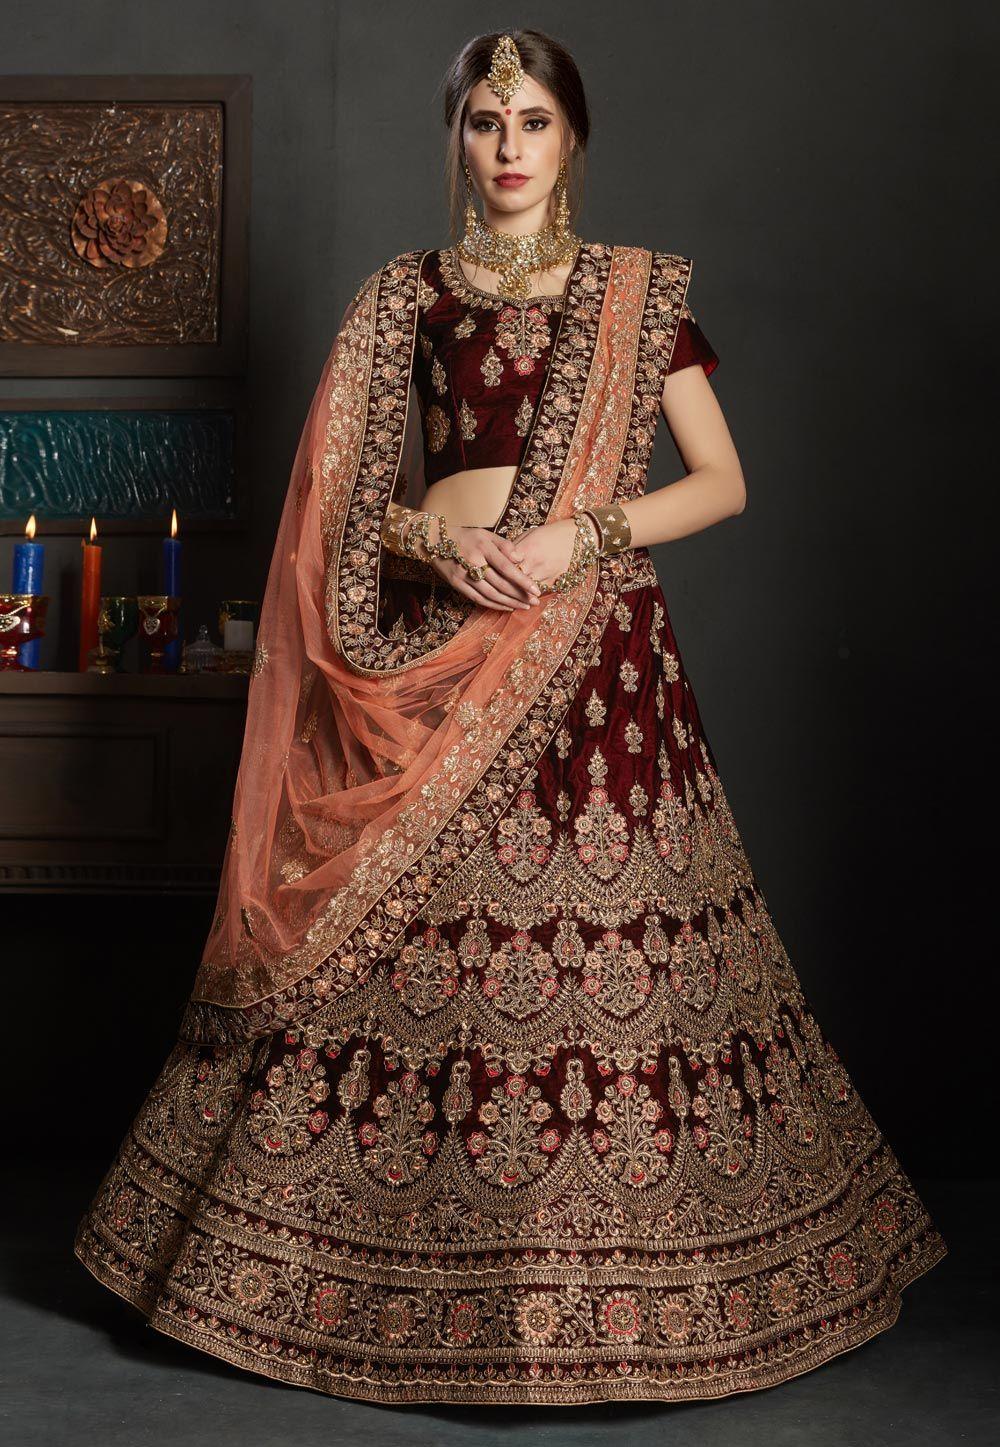 Maroon Velvet Bridal Lehenga Choli 163194 Bridal Lehenga Collection Indian Bridal Outfits Lehenga Collection,Outdoor Stairs Design